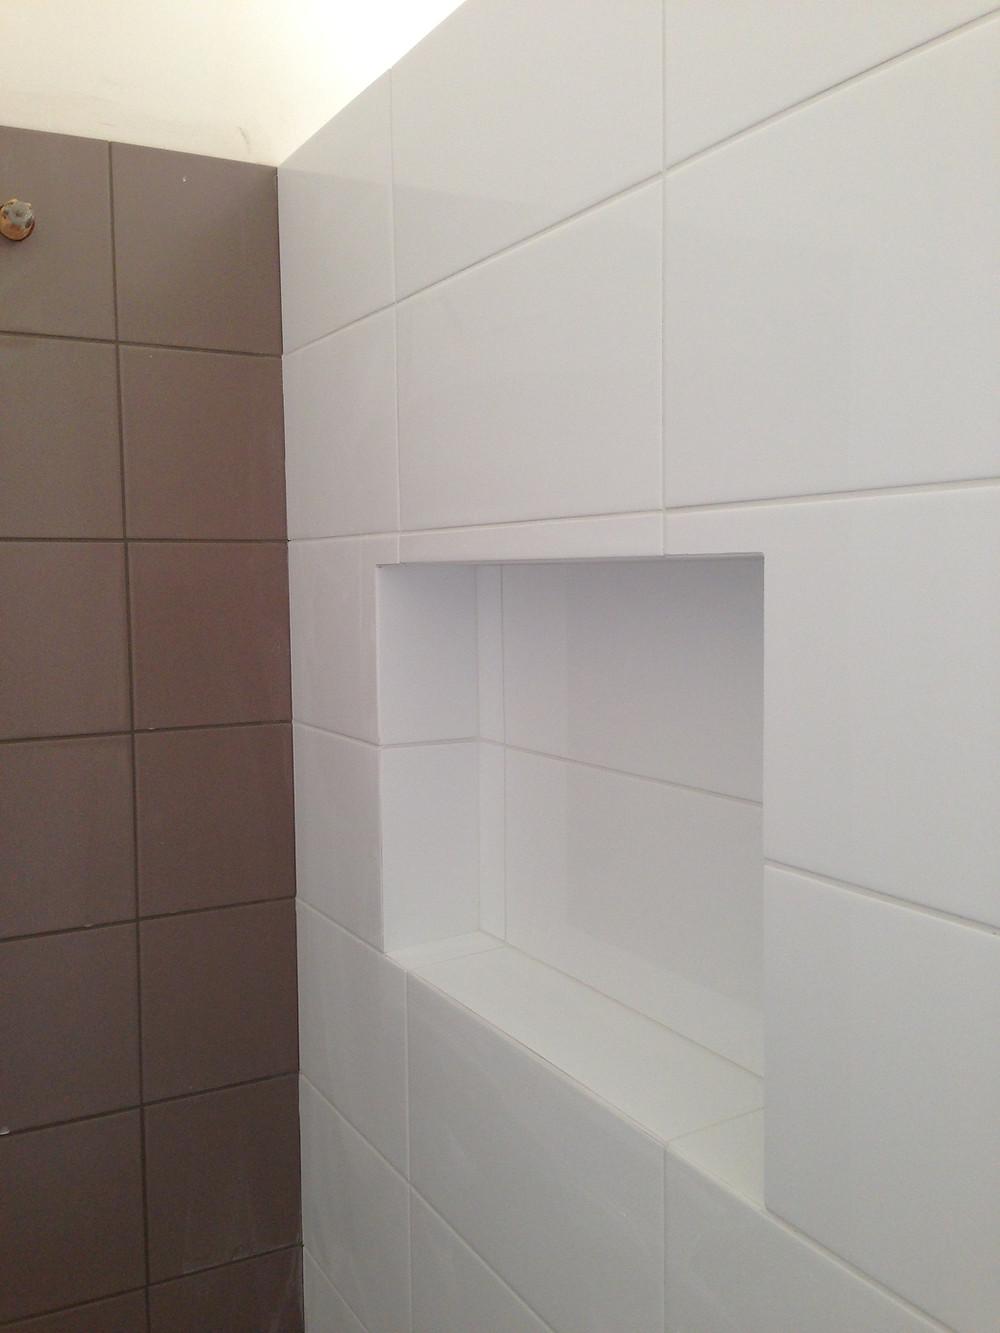 Bullnose shower niche